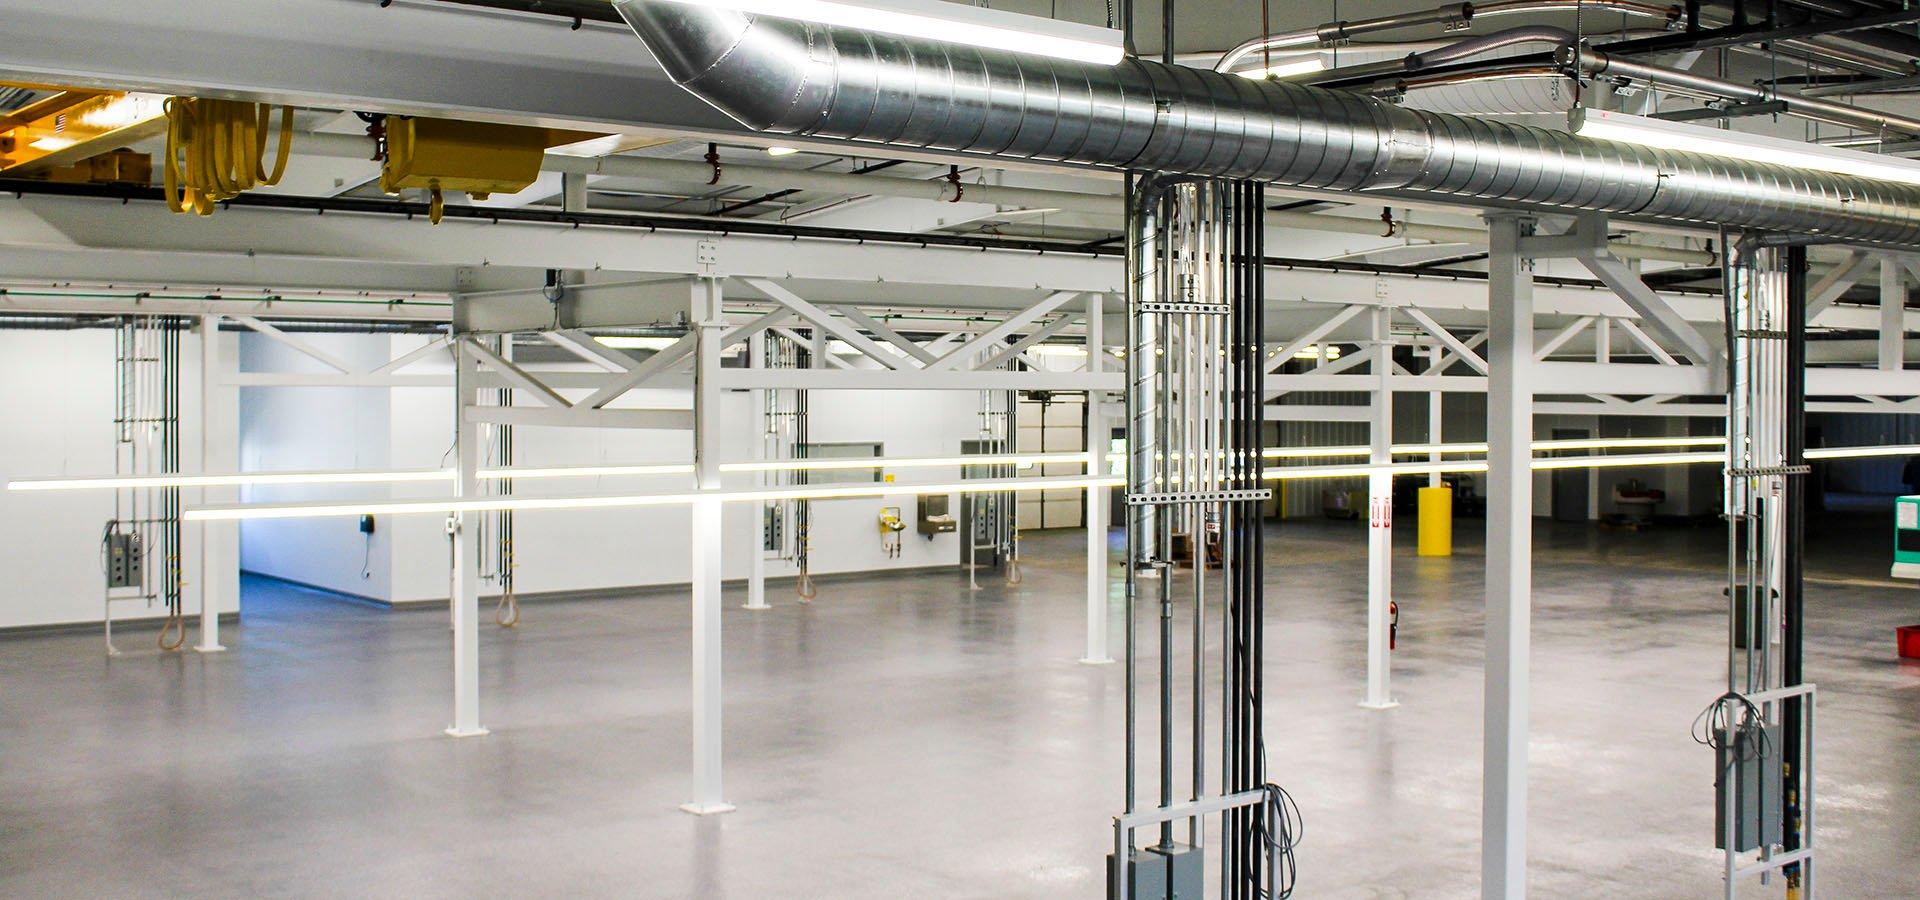 Ironwood plastics Inc. | Two Rivers, Wisconsin | A.C.E. Building Service